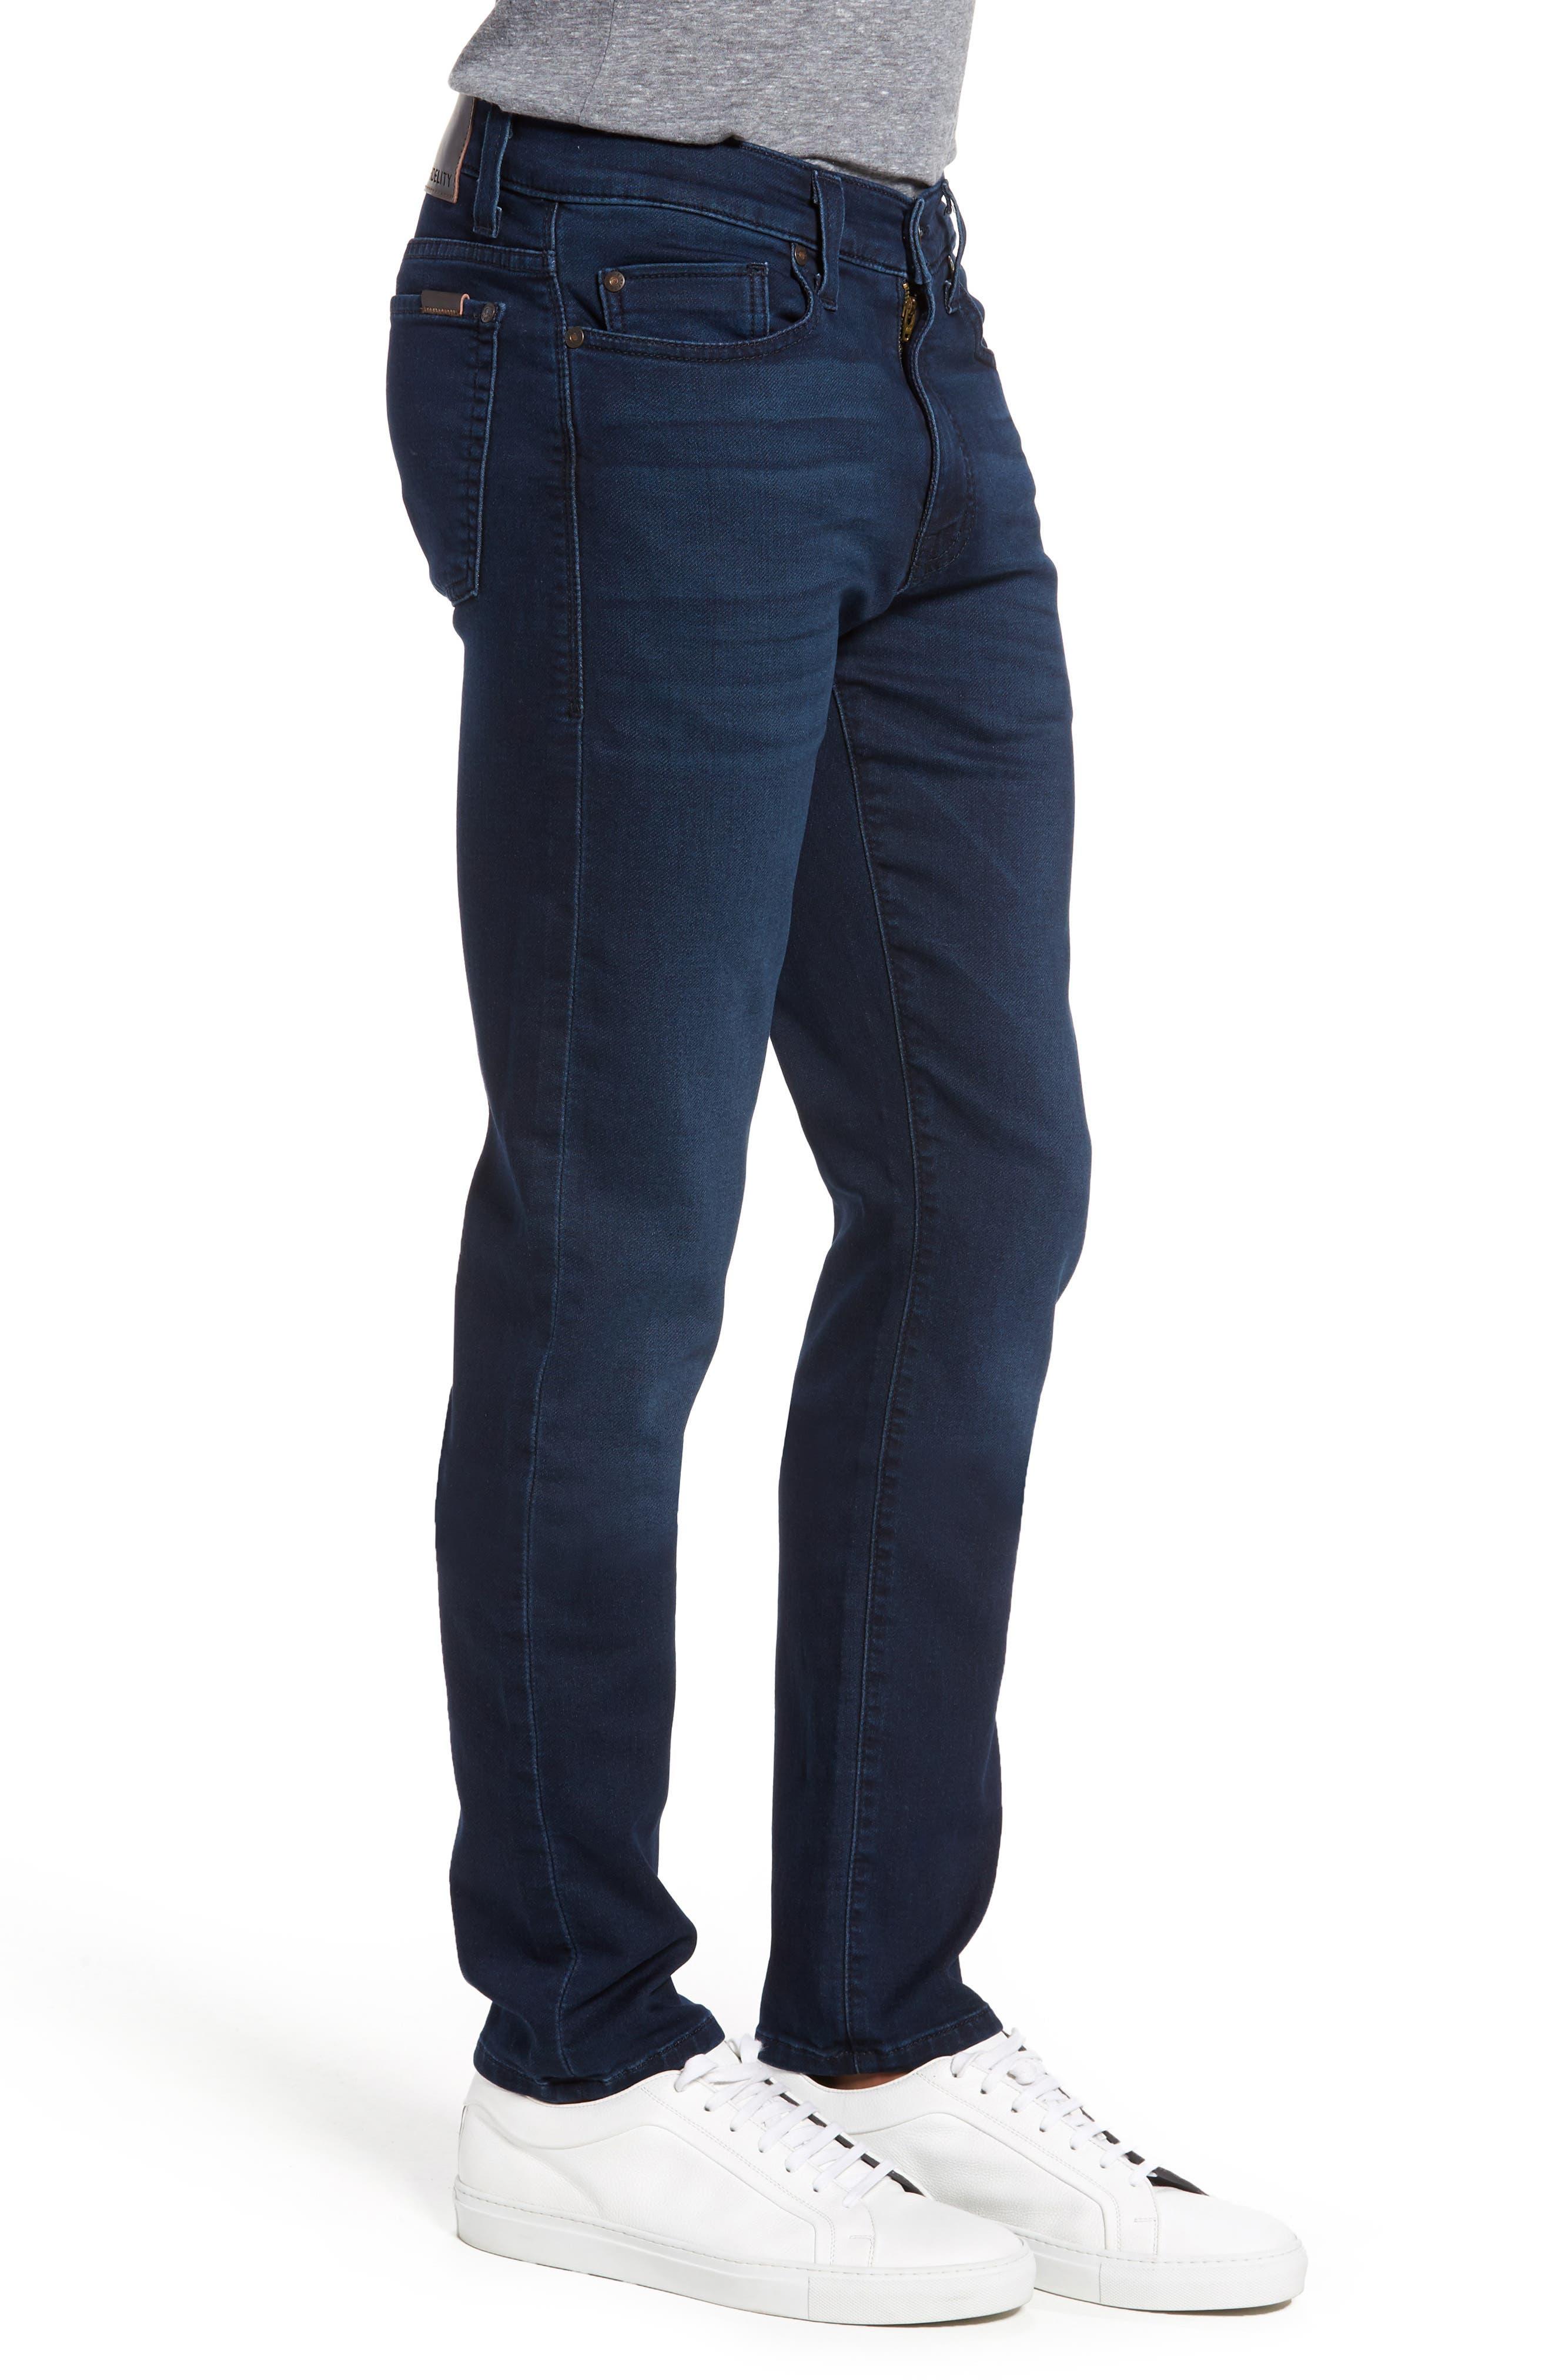 Torino Slim Fit Jeans,                             Alternate thumbnail 3, color,                             Lemmy Blue